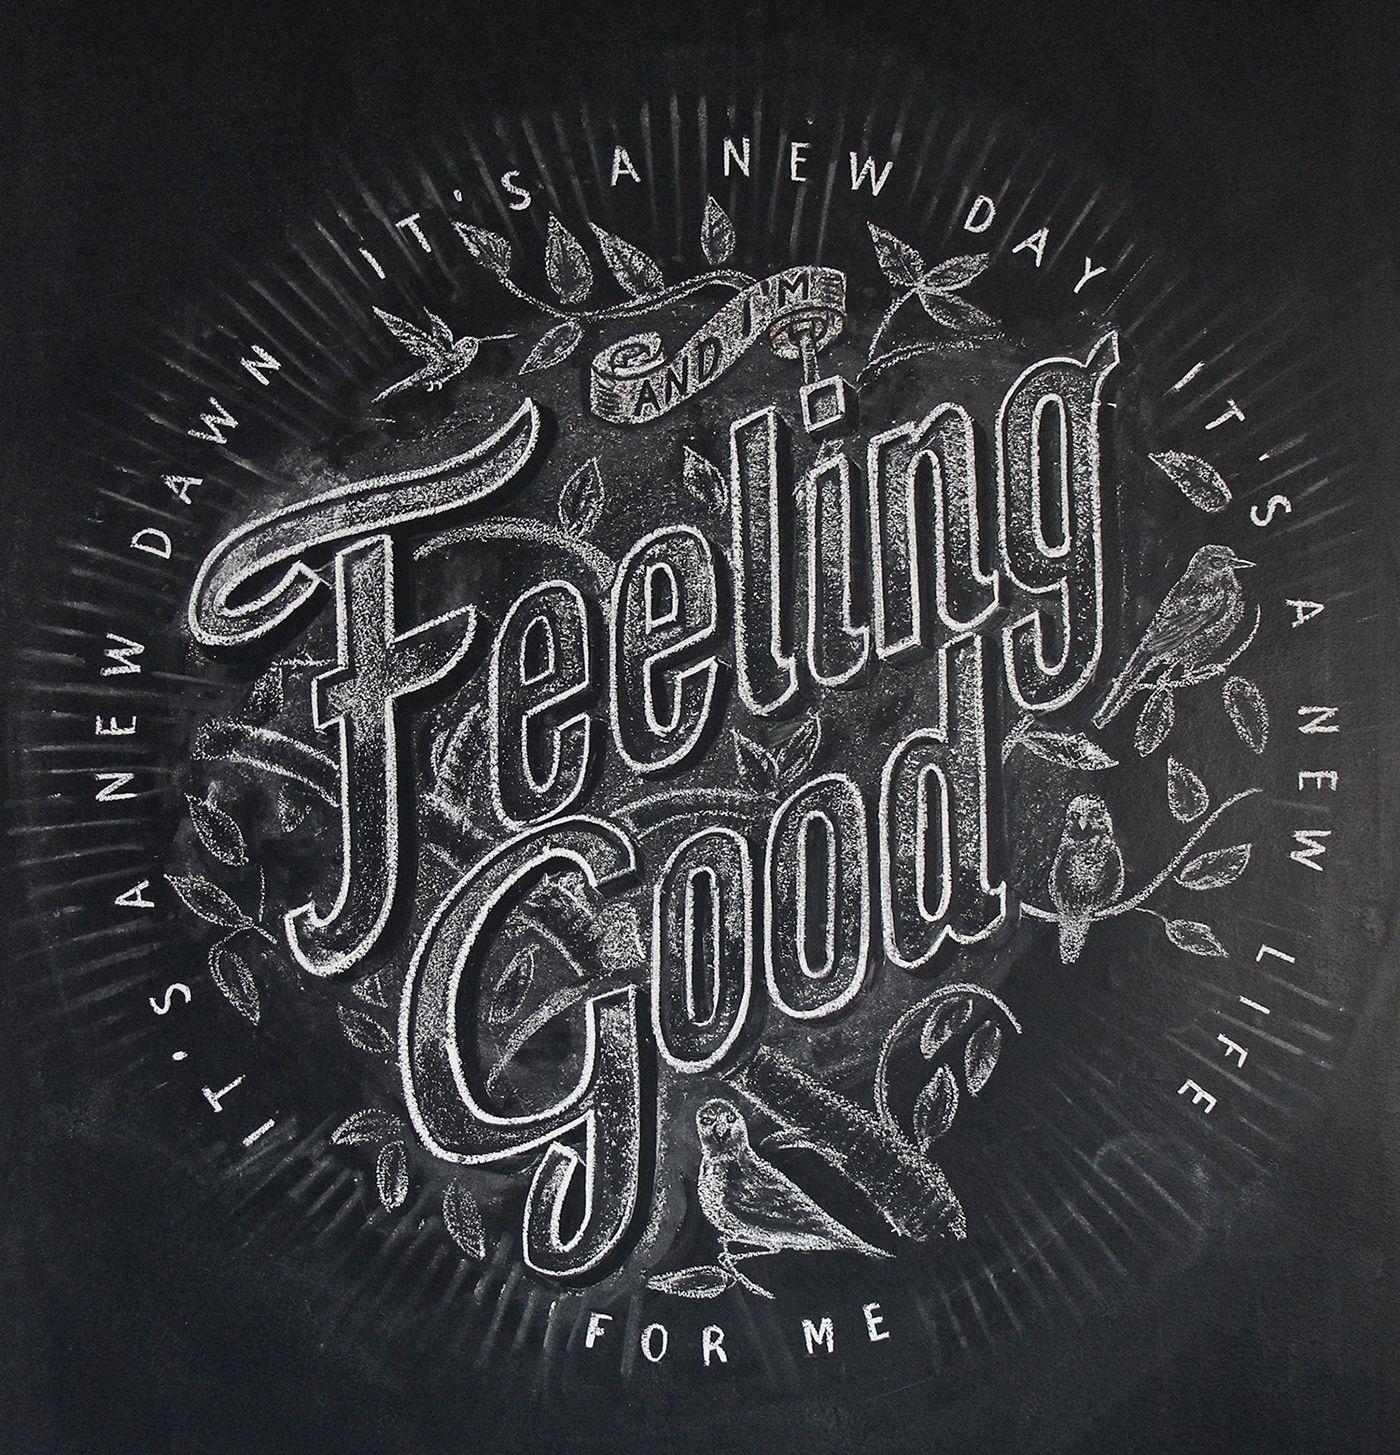 T shirt design inspiration typography -  Lettering Type Inspiration Chalkboard Typographychalkboard